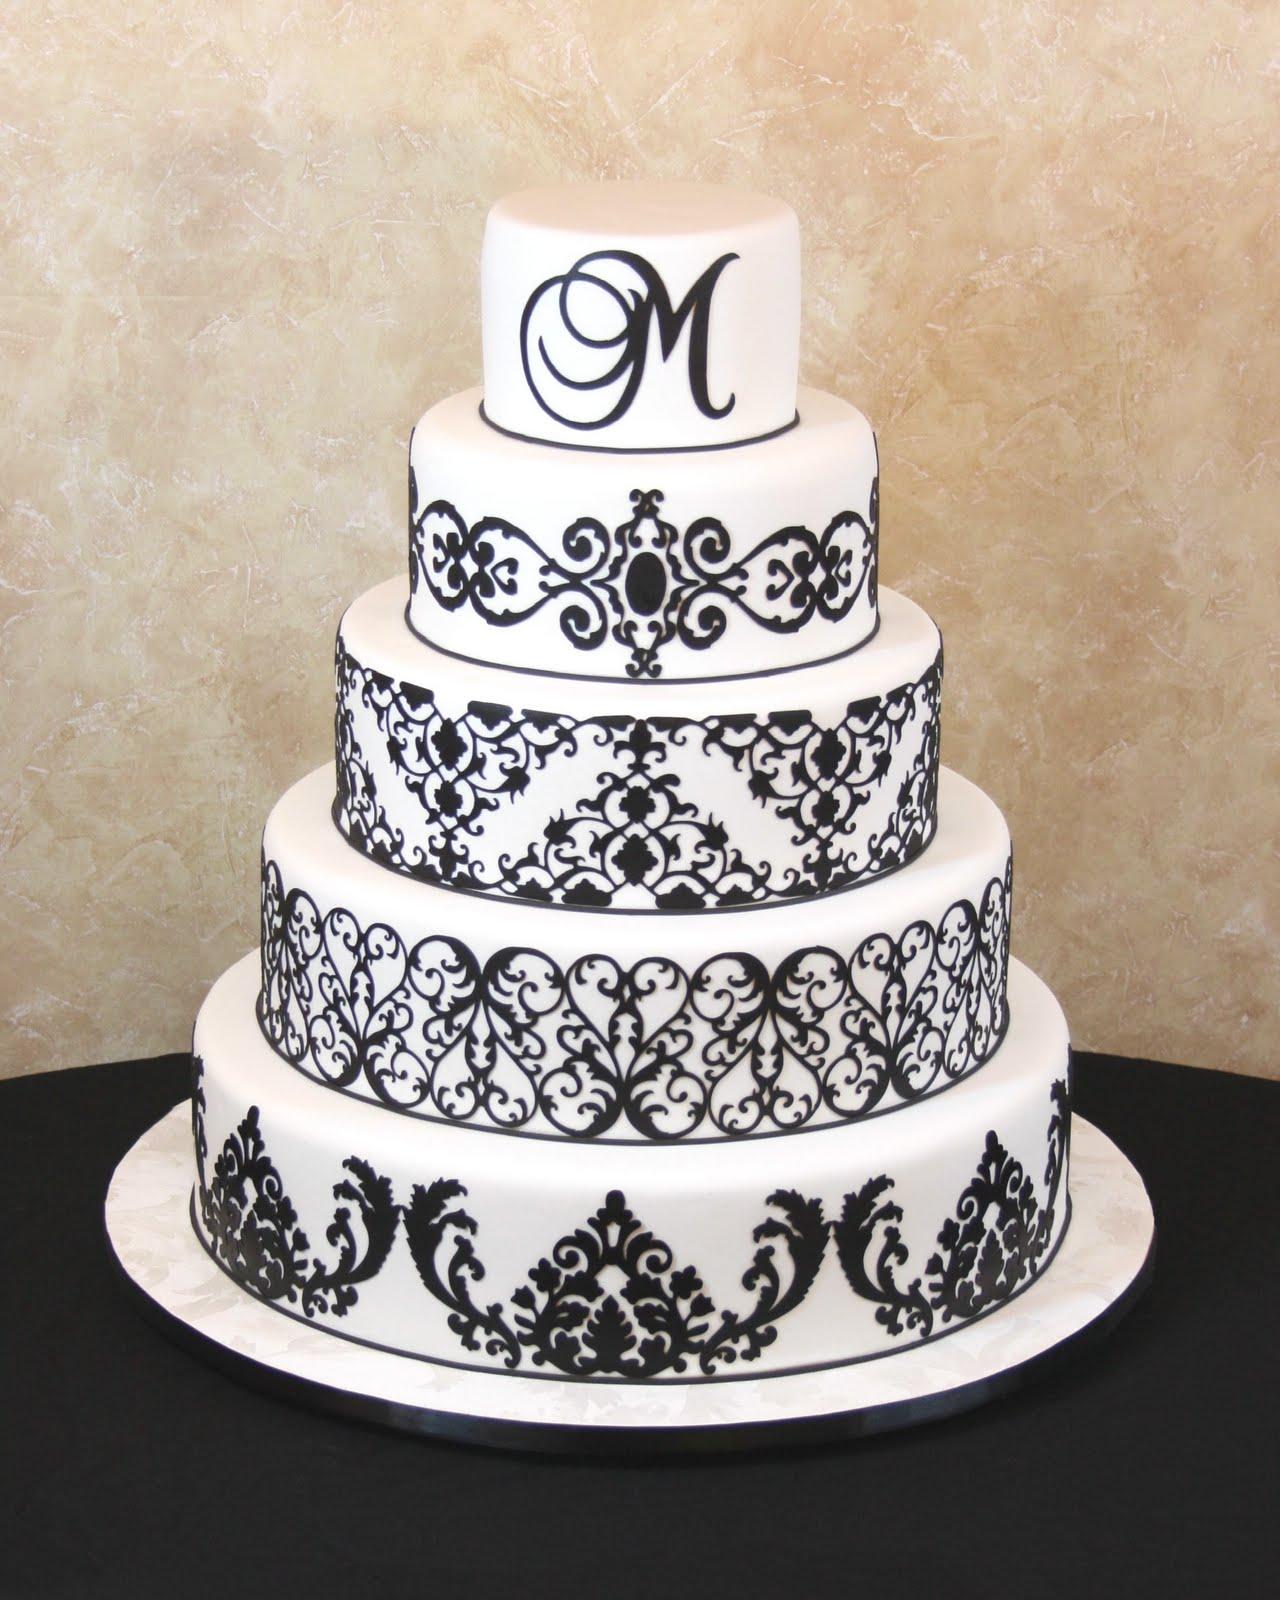 Cricut Cake For Your Kids Parties Ideas